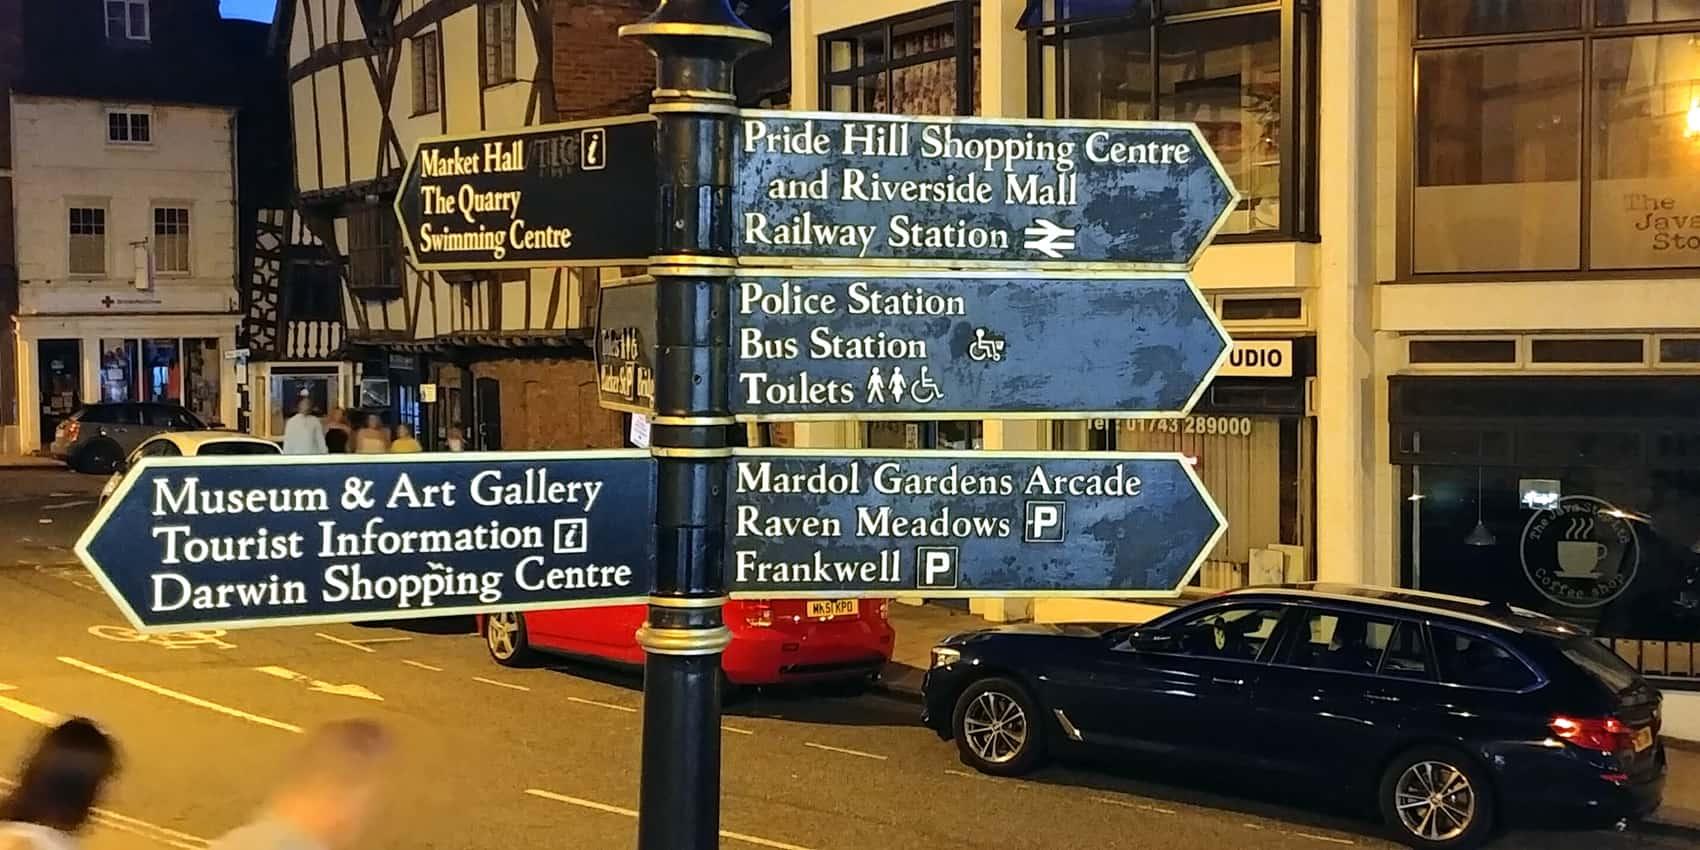 Direction signs in Shrewsbury Shropshire England